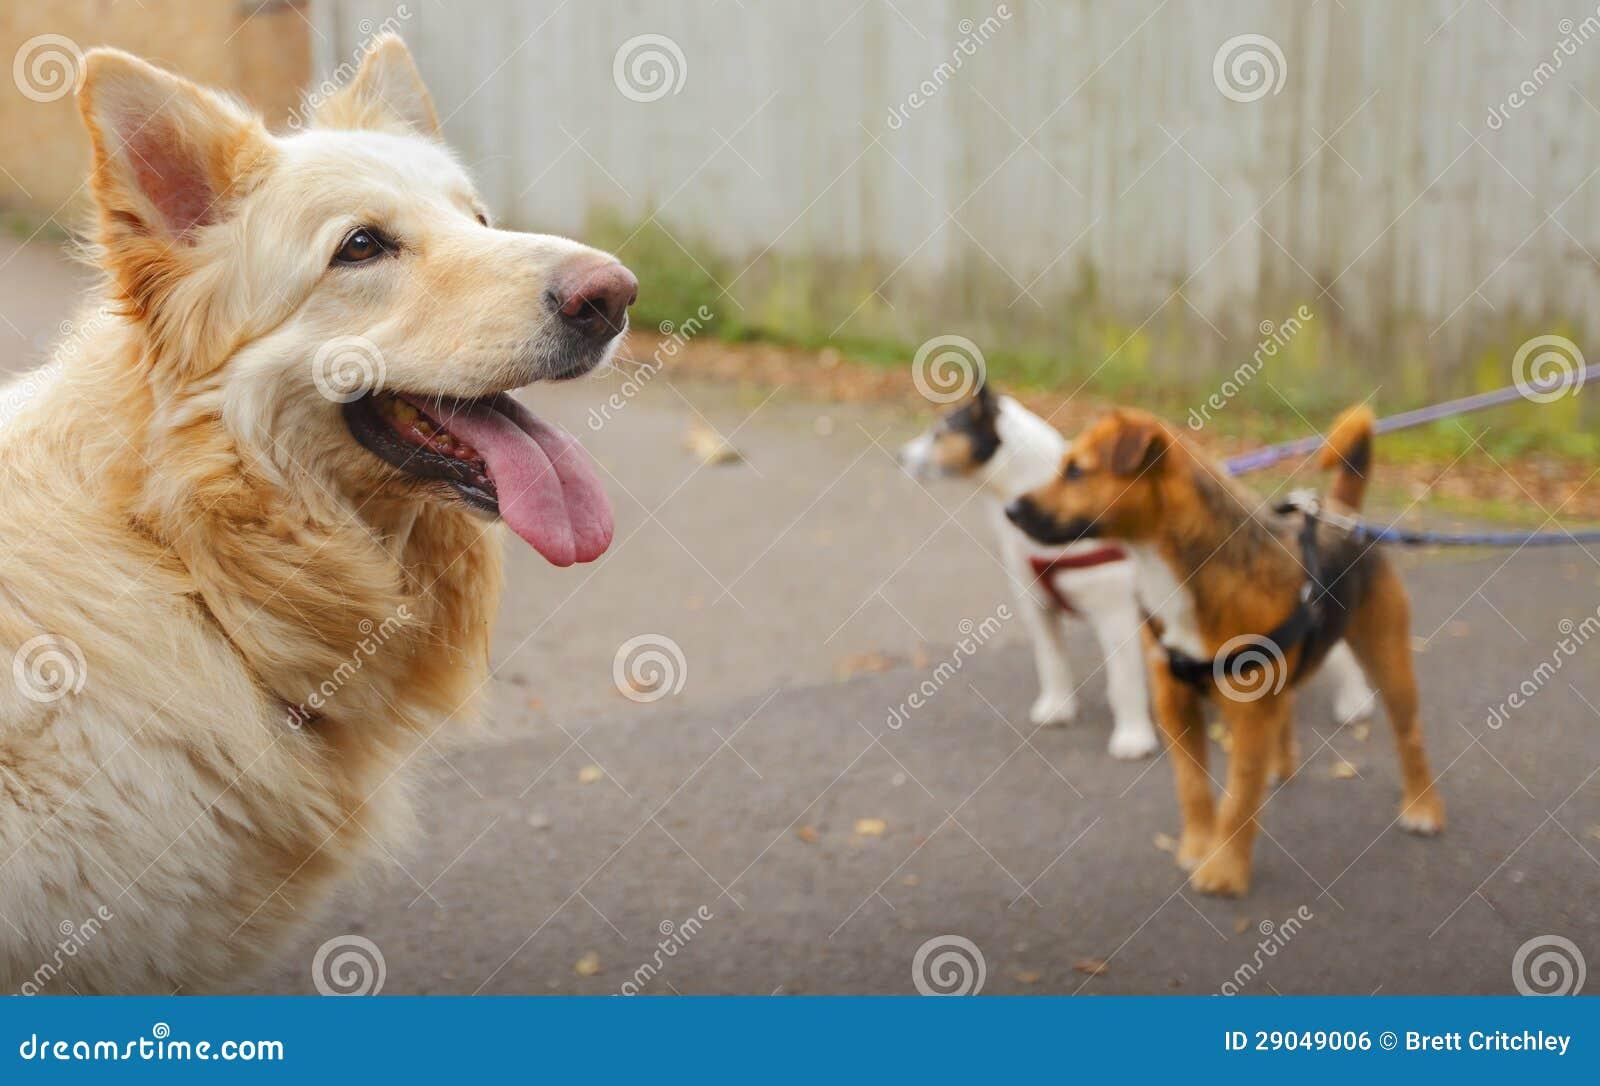 Dog Walking Dogs Royalty Free Stock Image